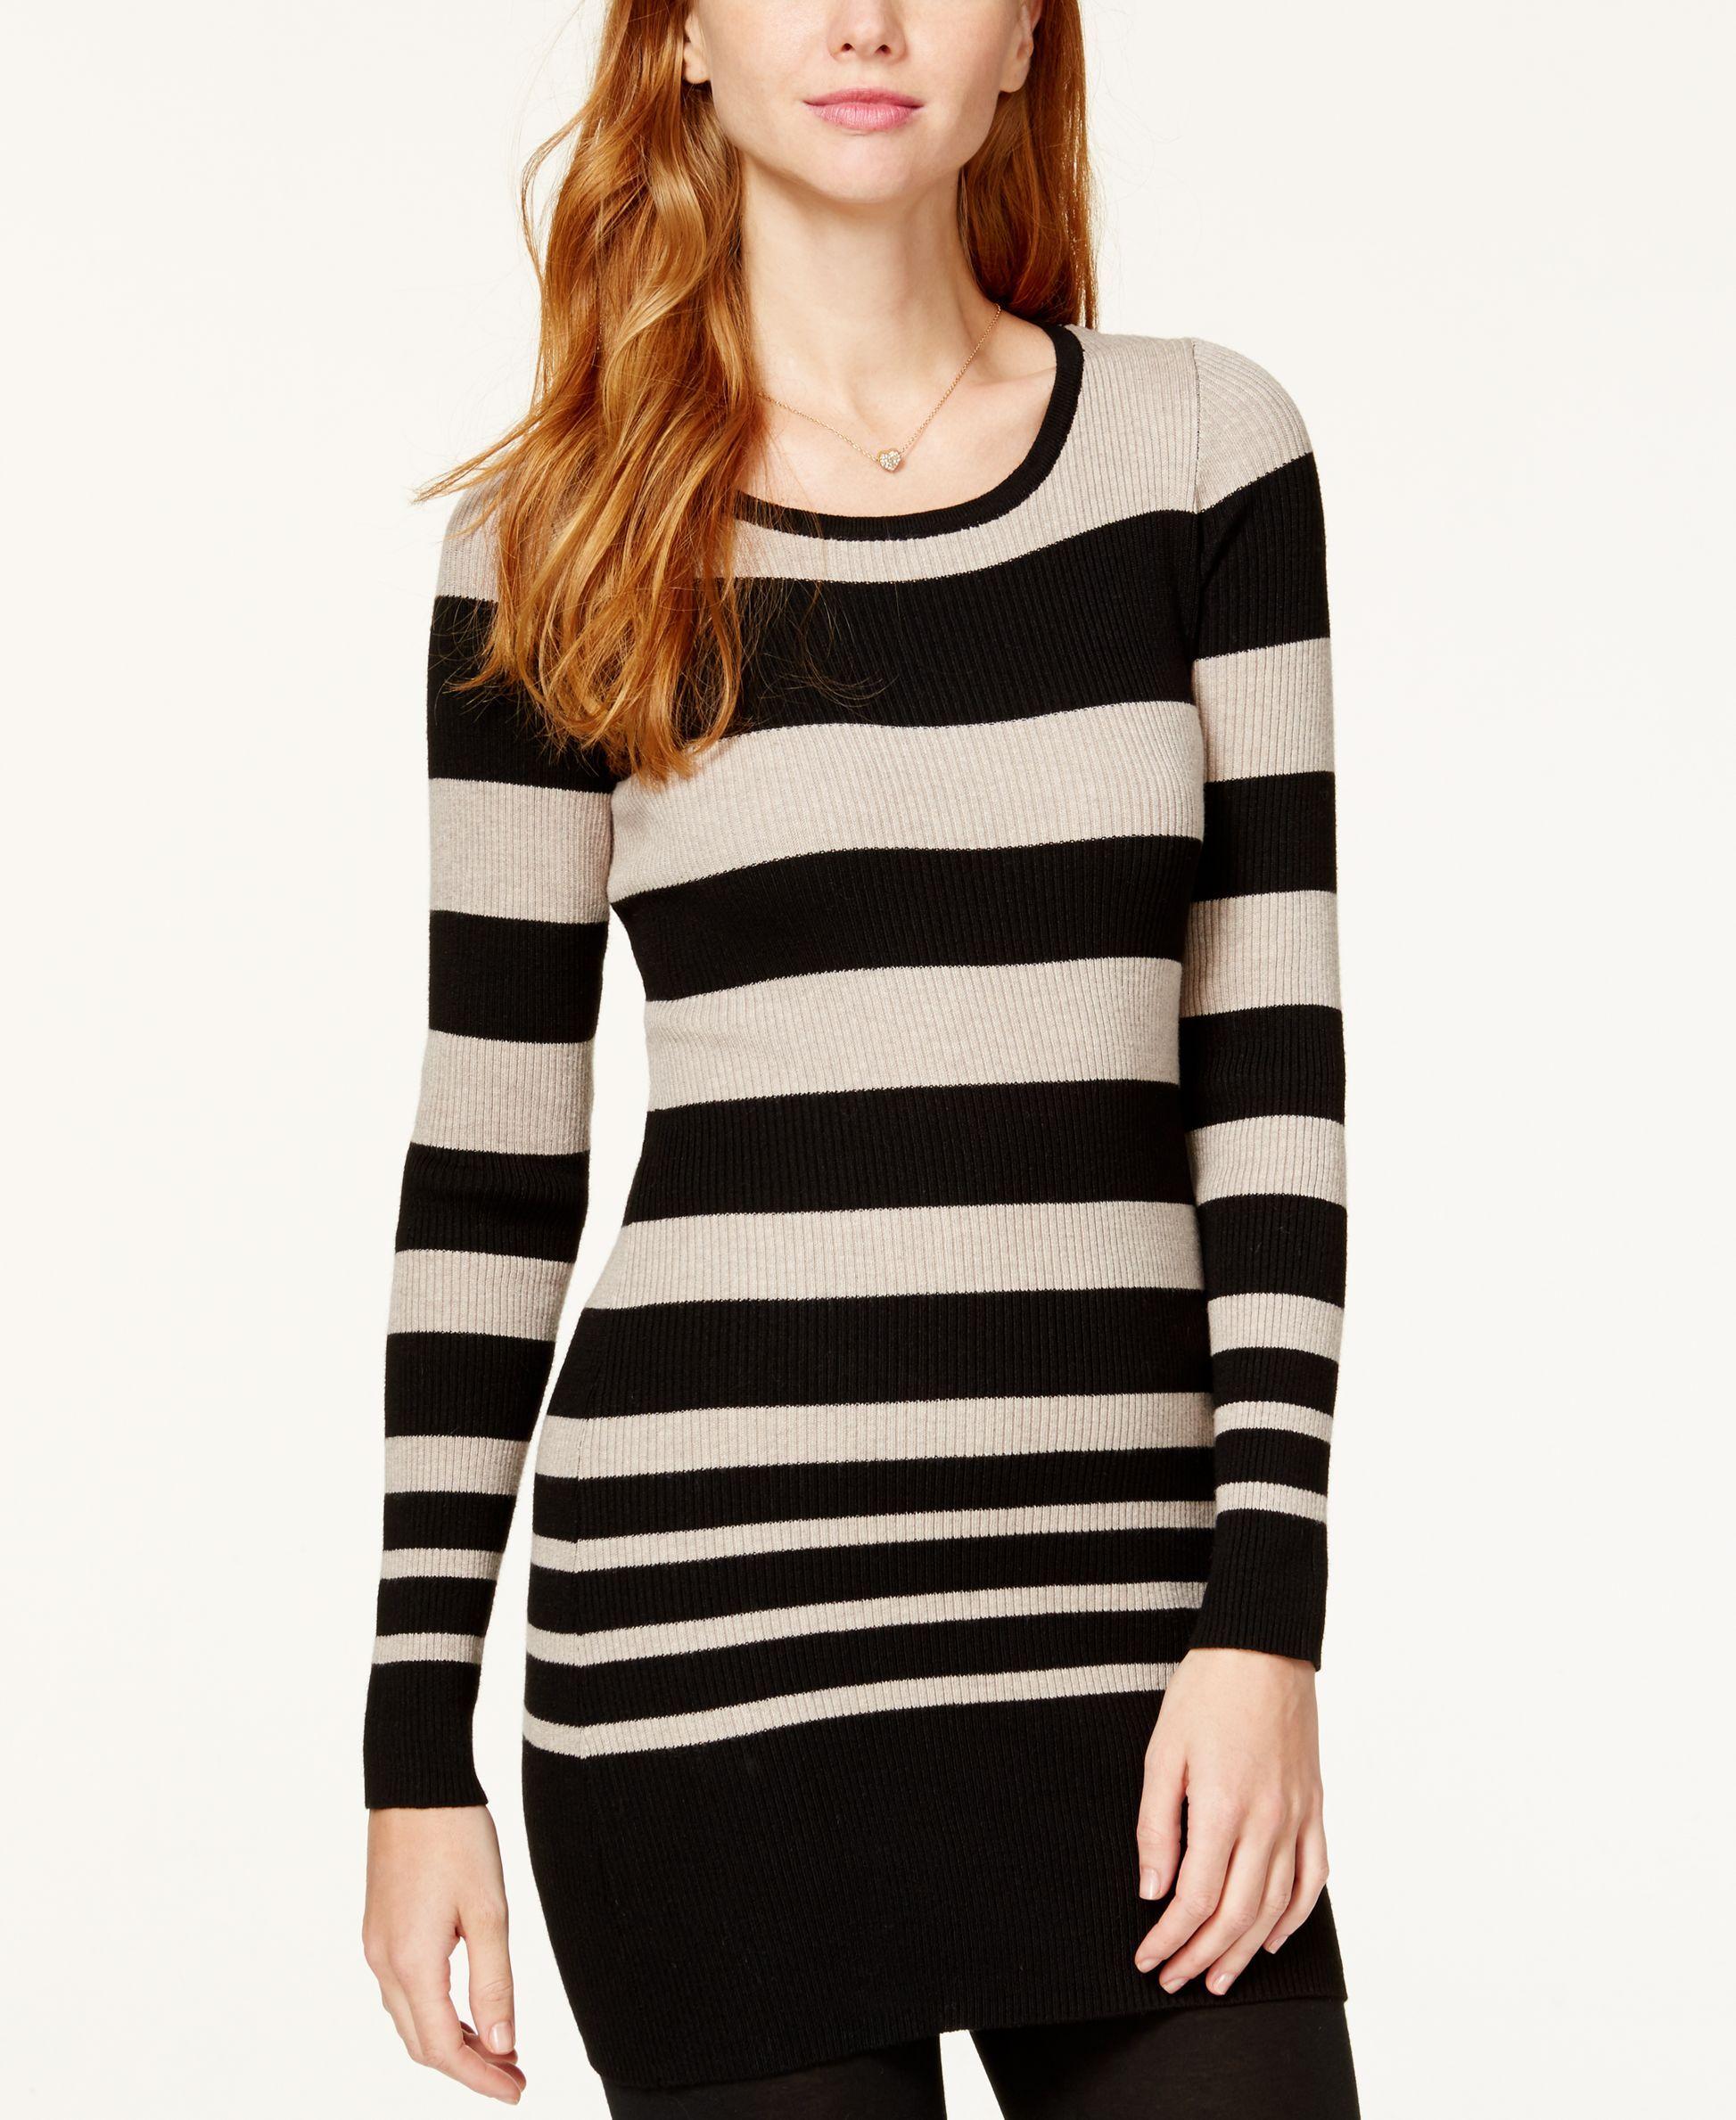 Bcx Juniors' Striped Tunic Sweater | Products | Pinterest | Tunic ...